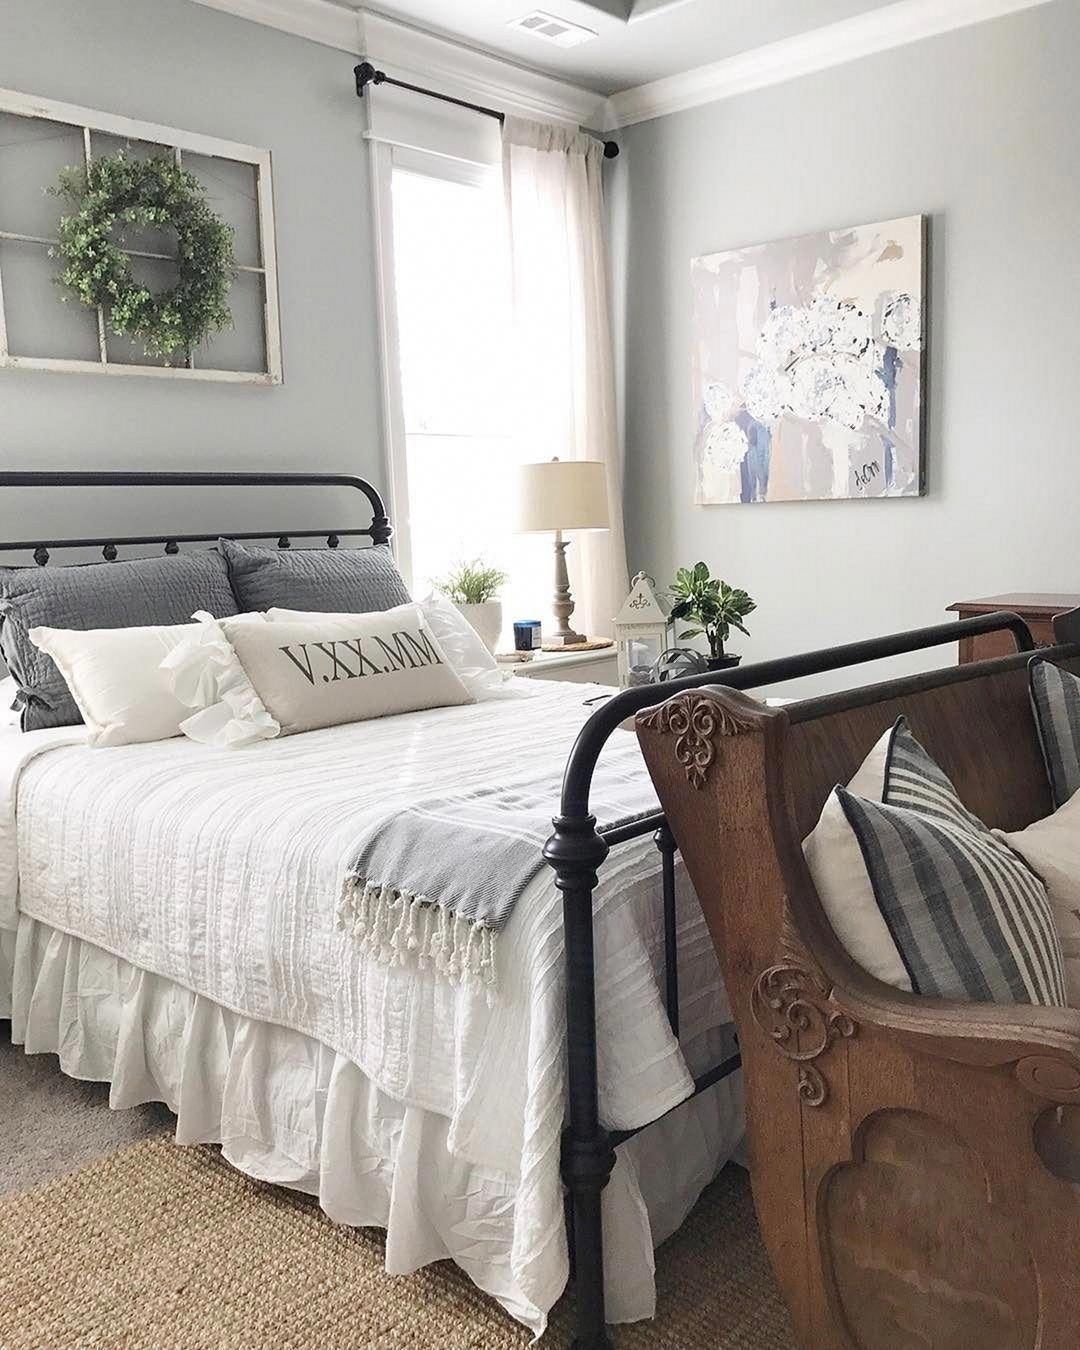 58 small scandinavian bedroom ideas master bedrooms